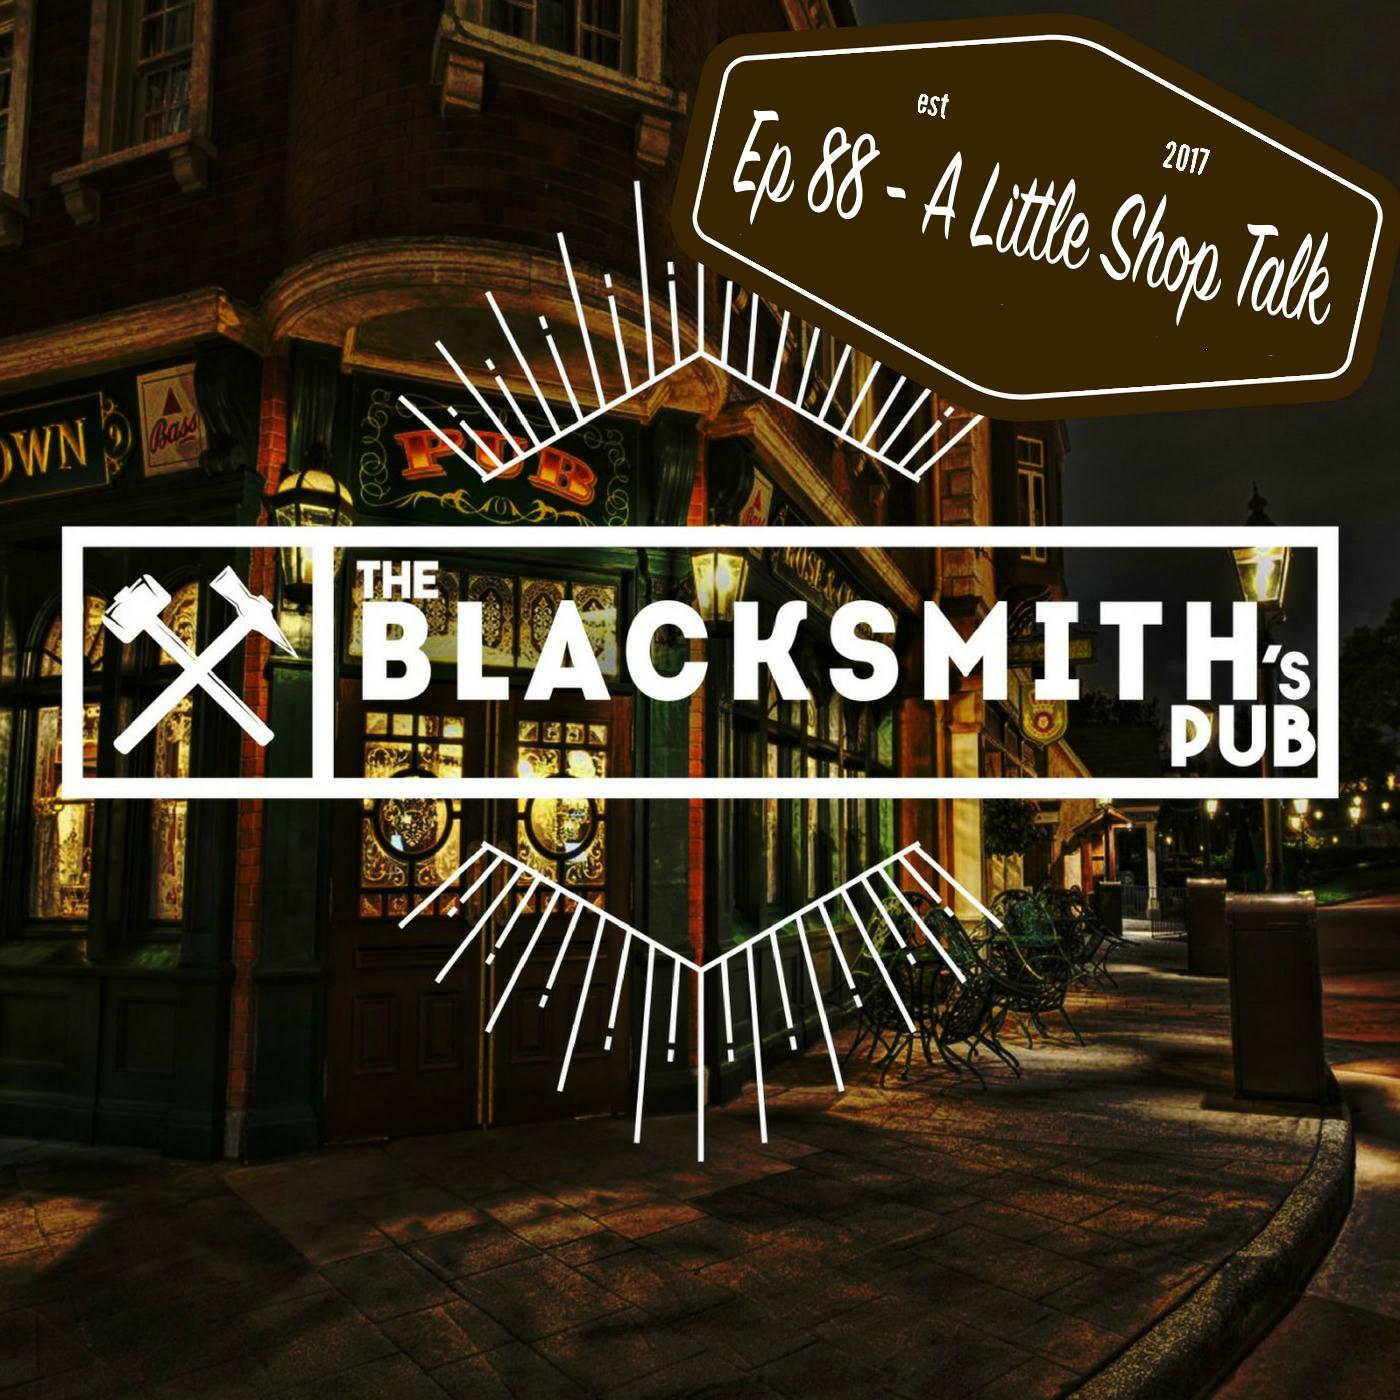 Ep 88 - A Little Shop Talk